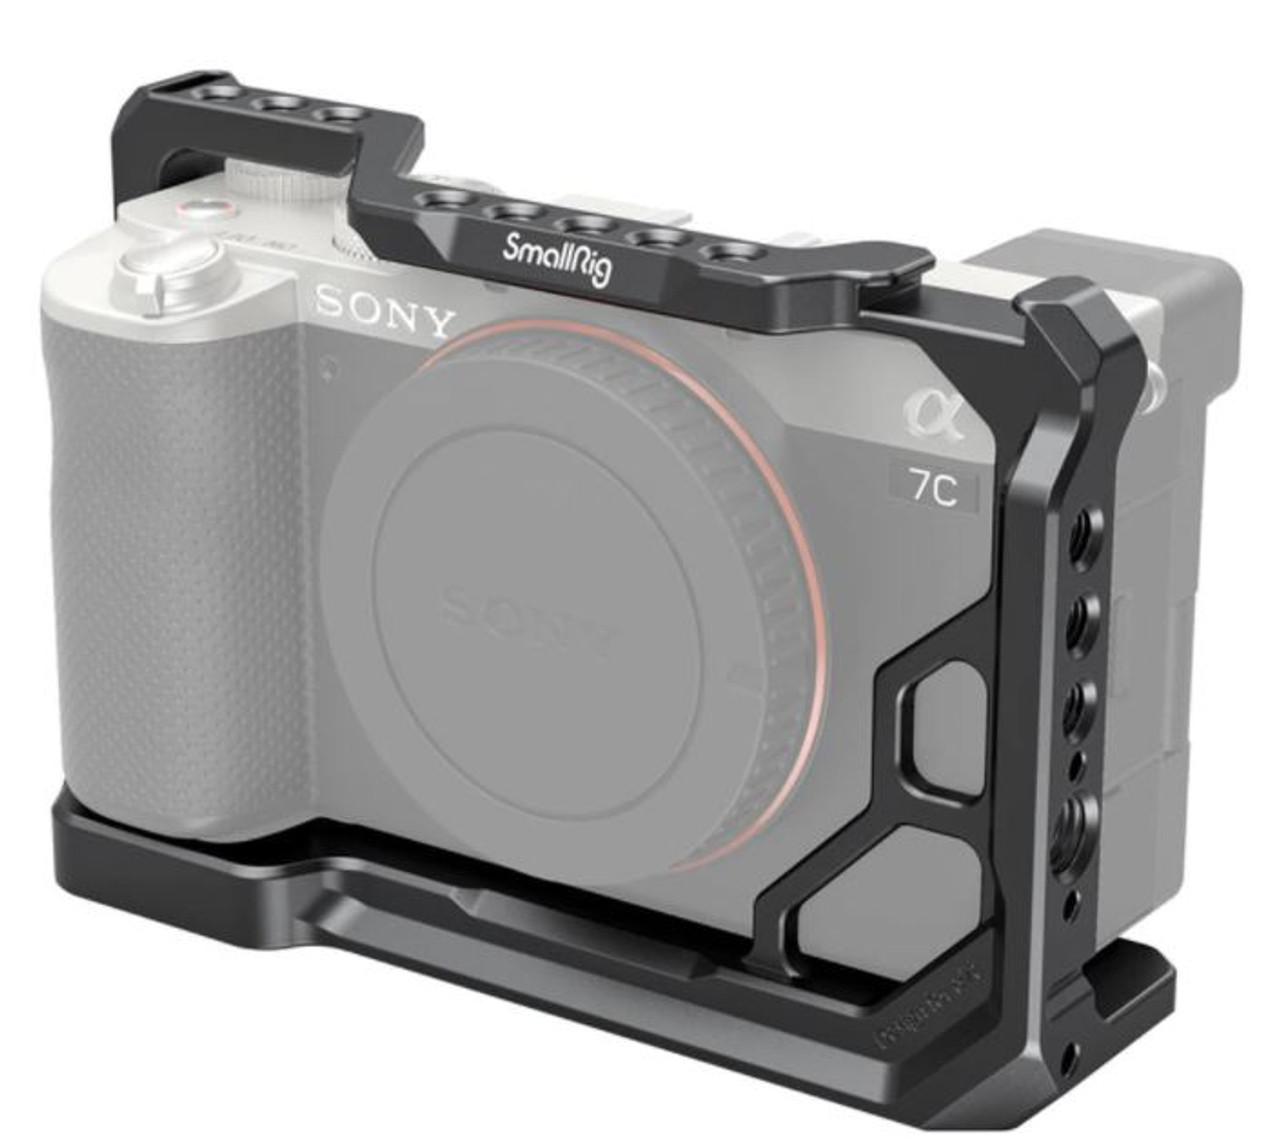 SmallRig Camera Cage for Sony a7C